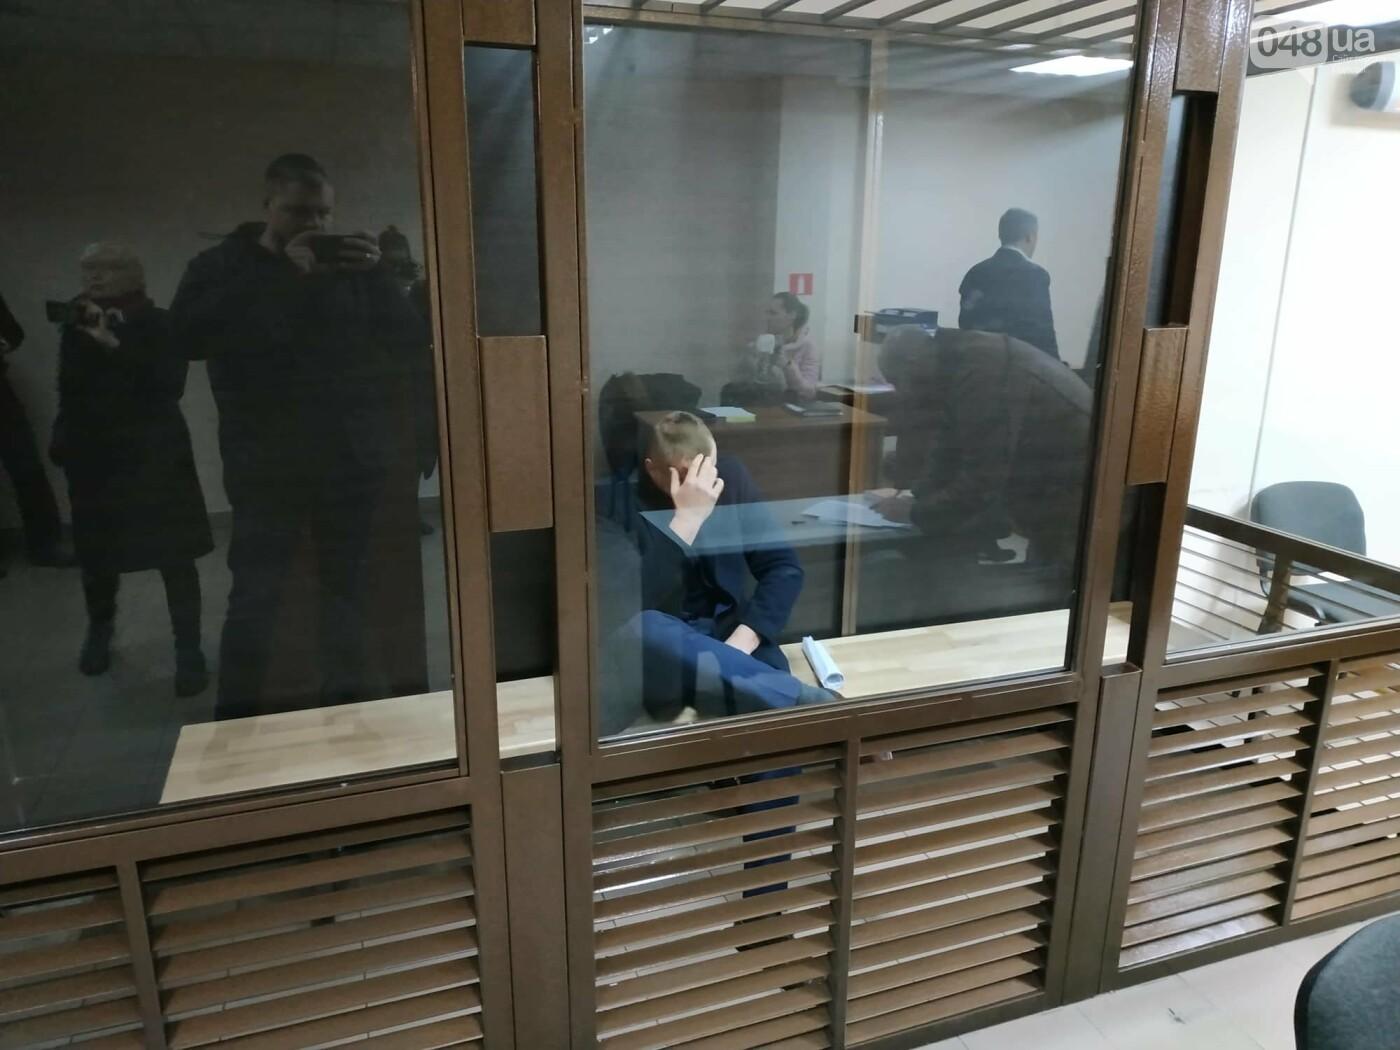 Одесскому псевдо-активисту избрали меру пресечения, - ФОТО, фото-5, Фото: Александр Жирносенко